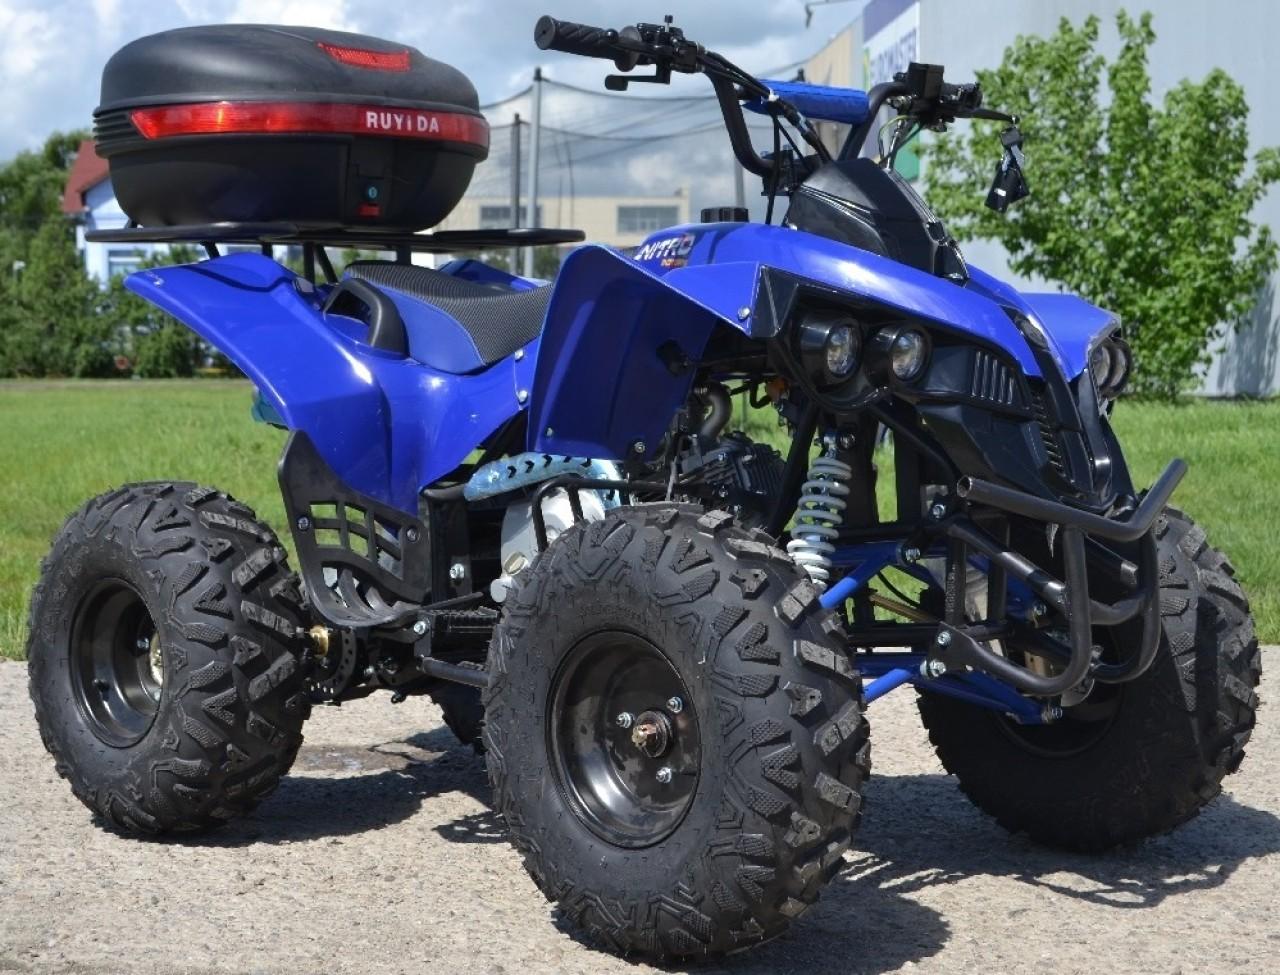 Atv Nitro Renegade Riders 125cc Deluxe New-2019